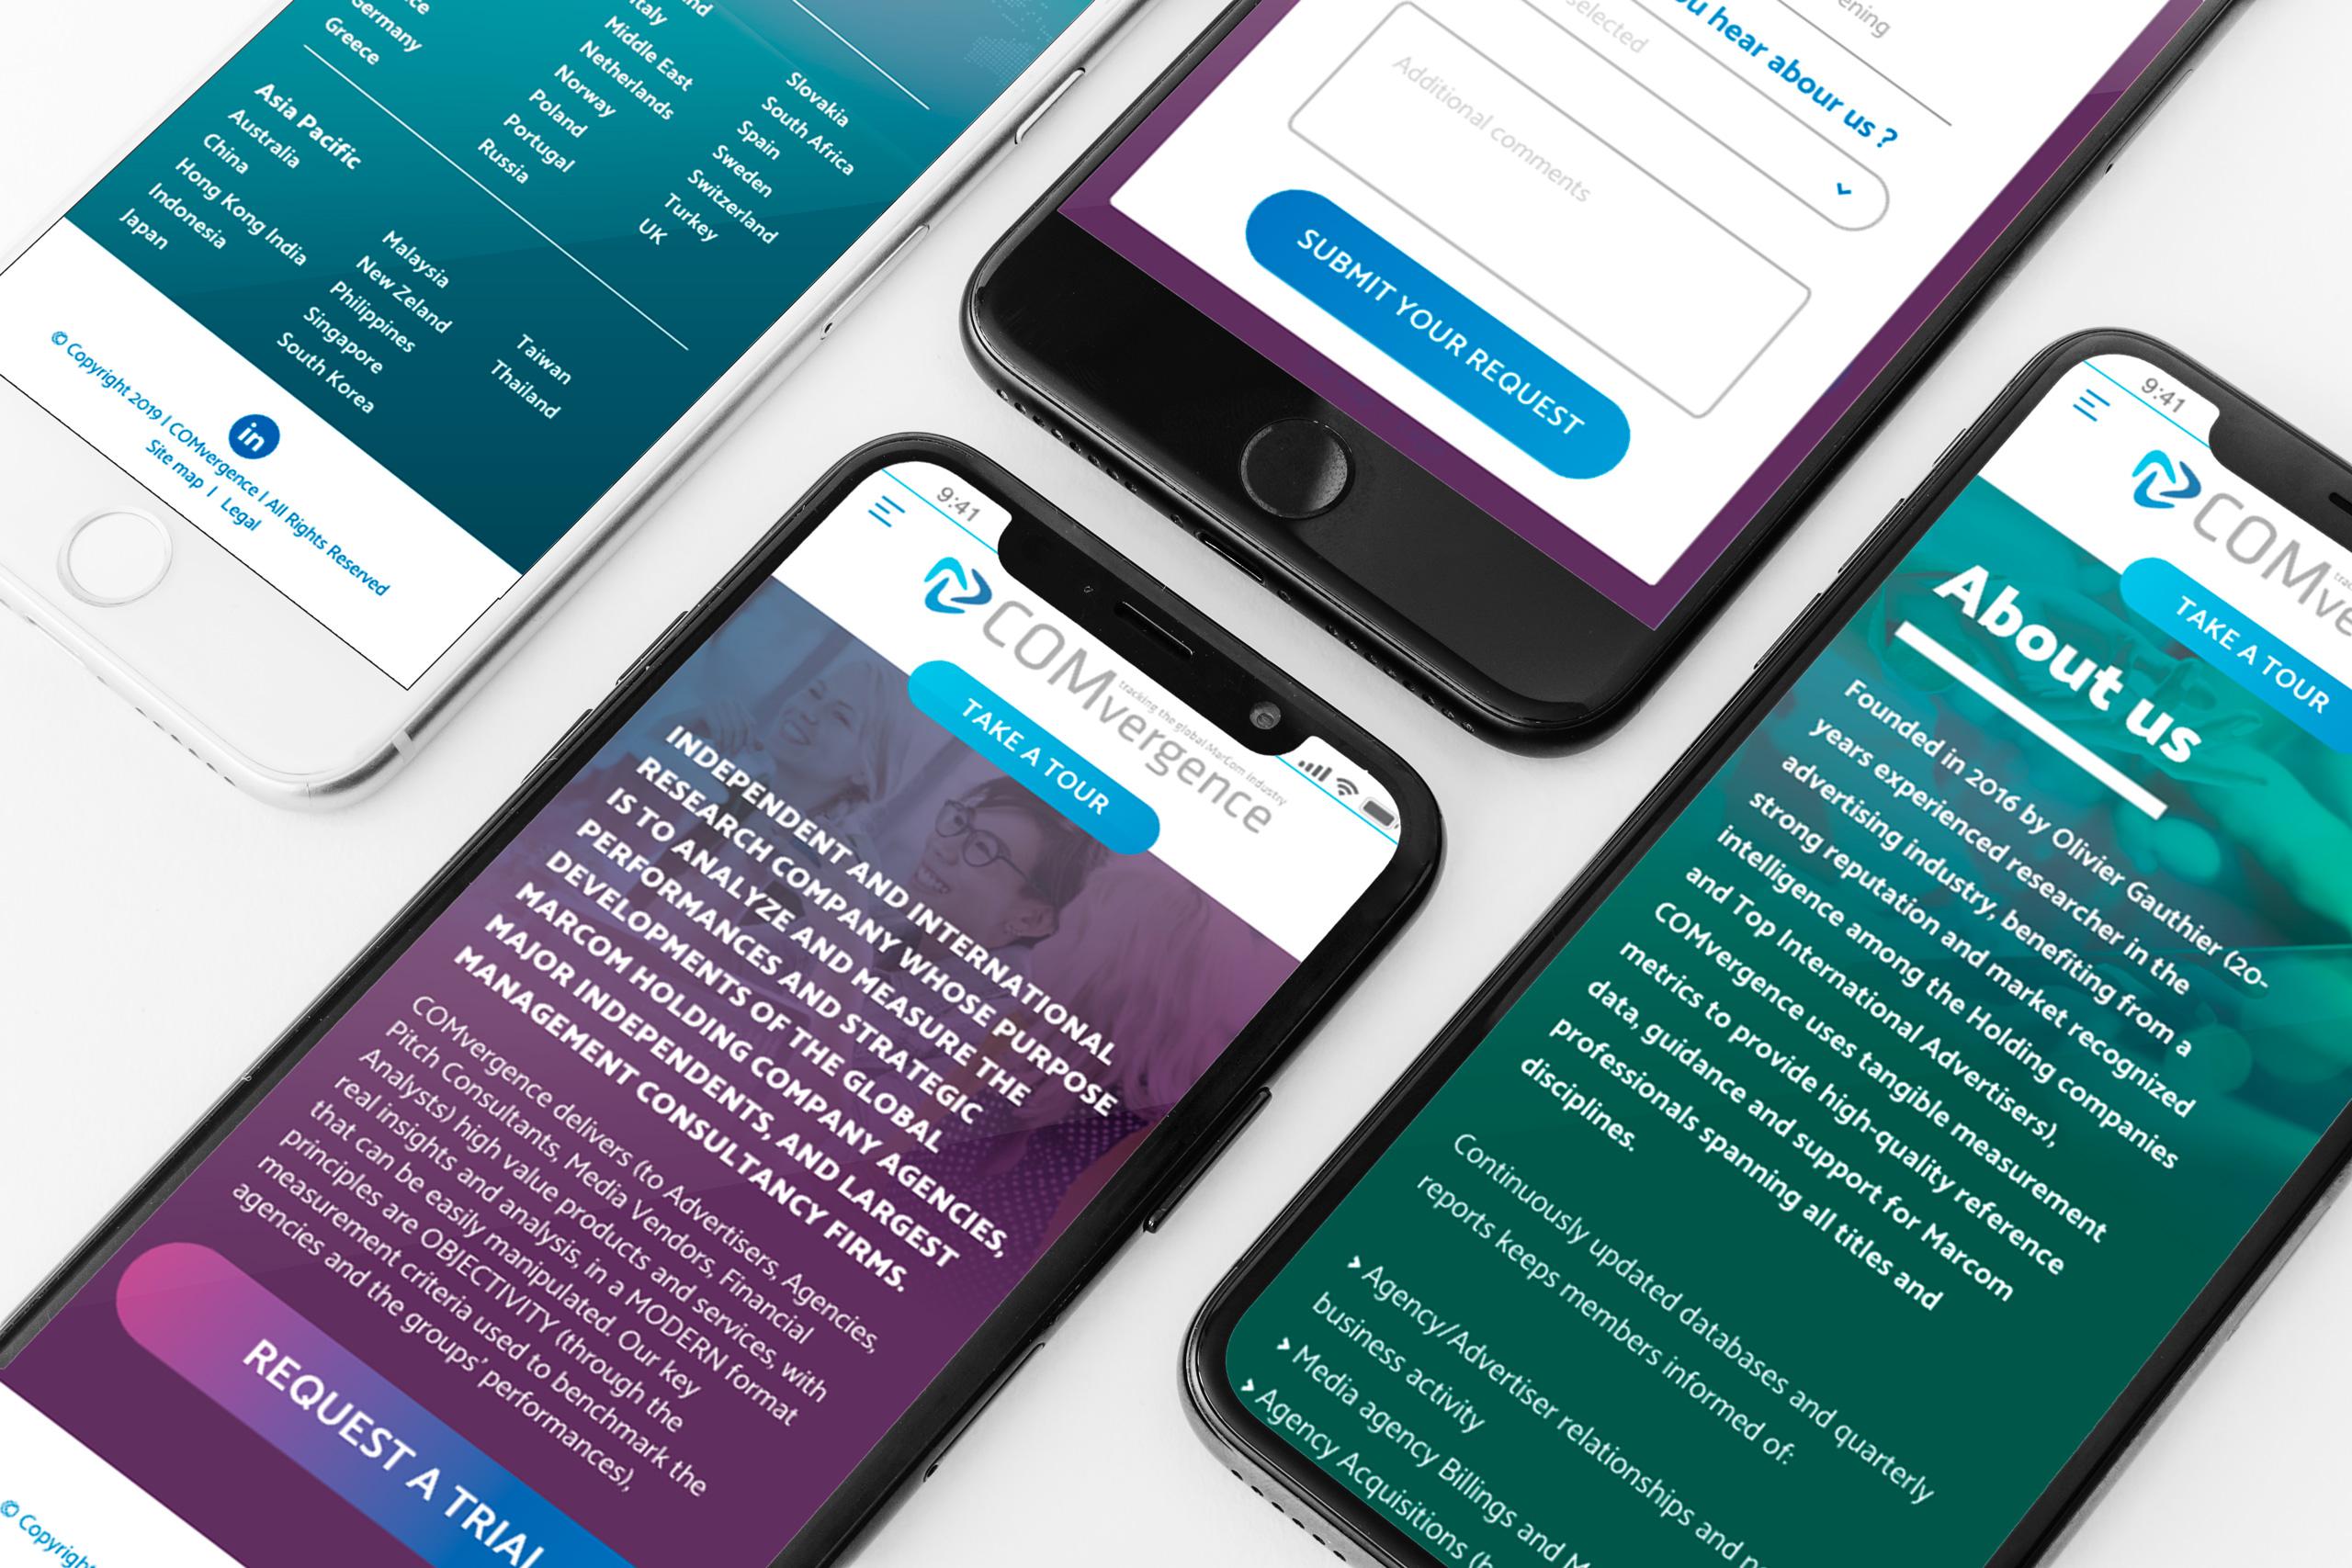 COMvergence WebSite mobile